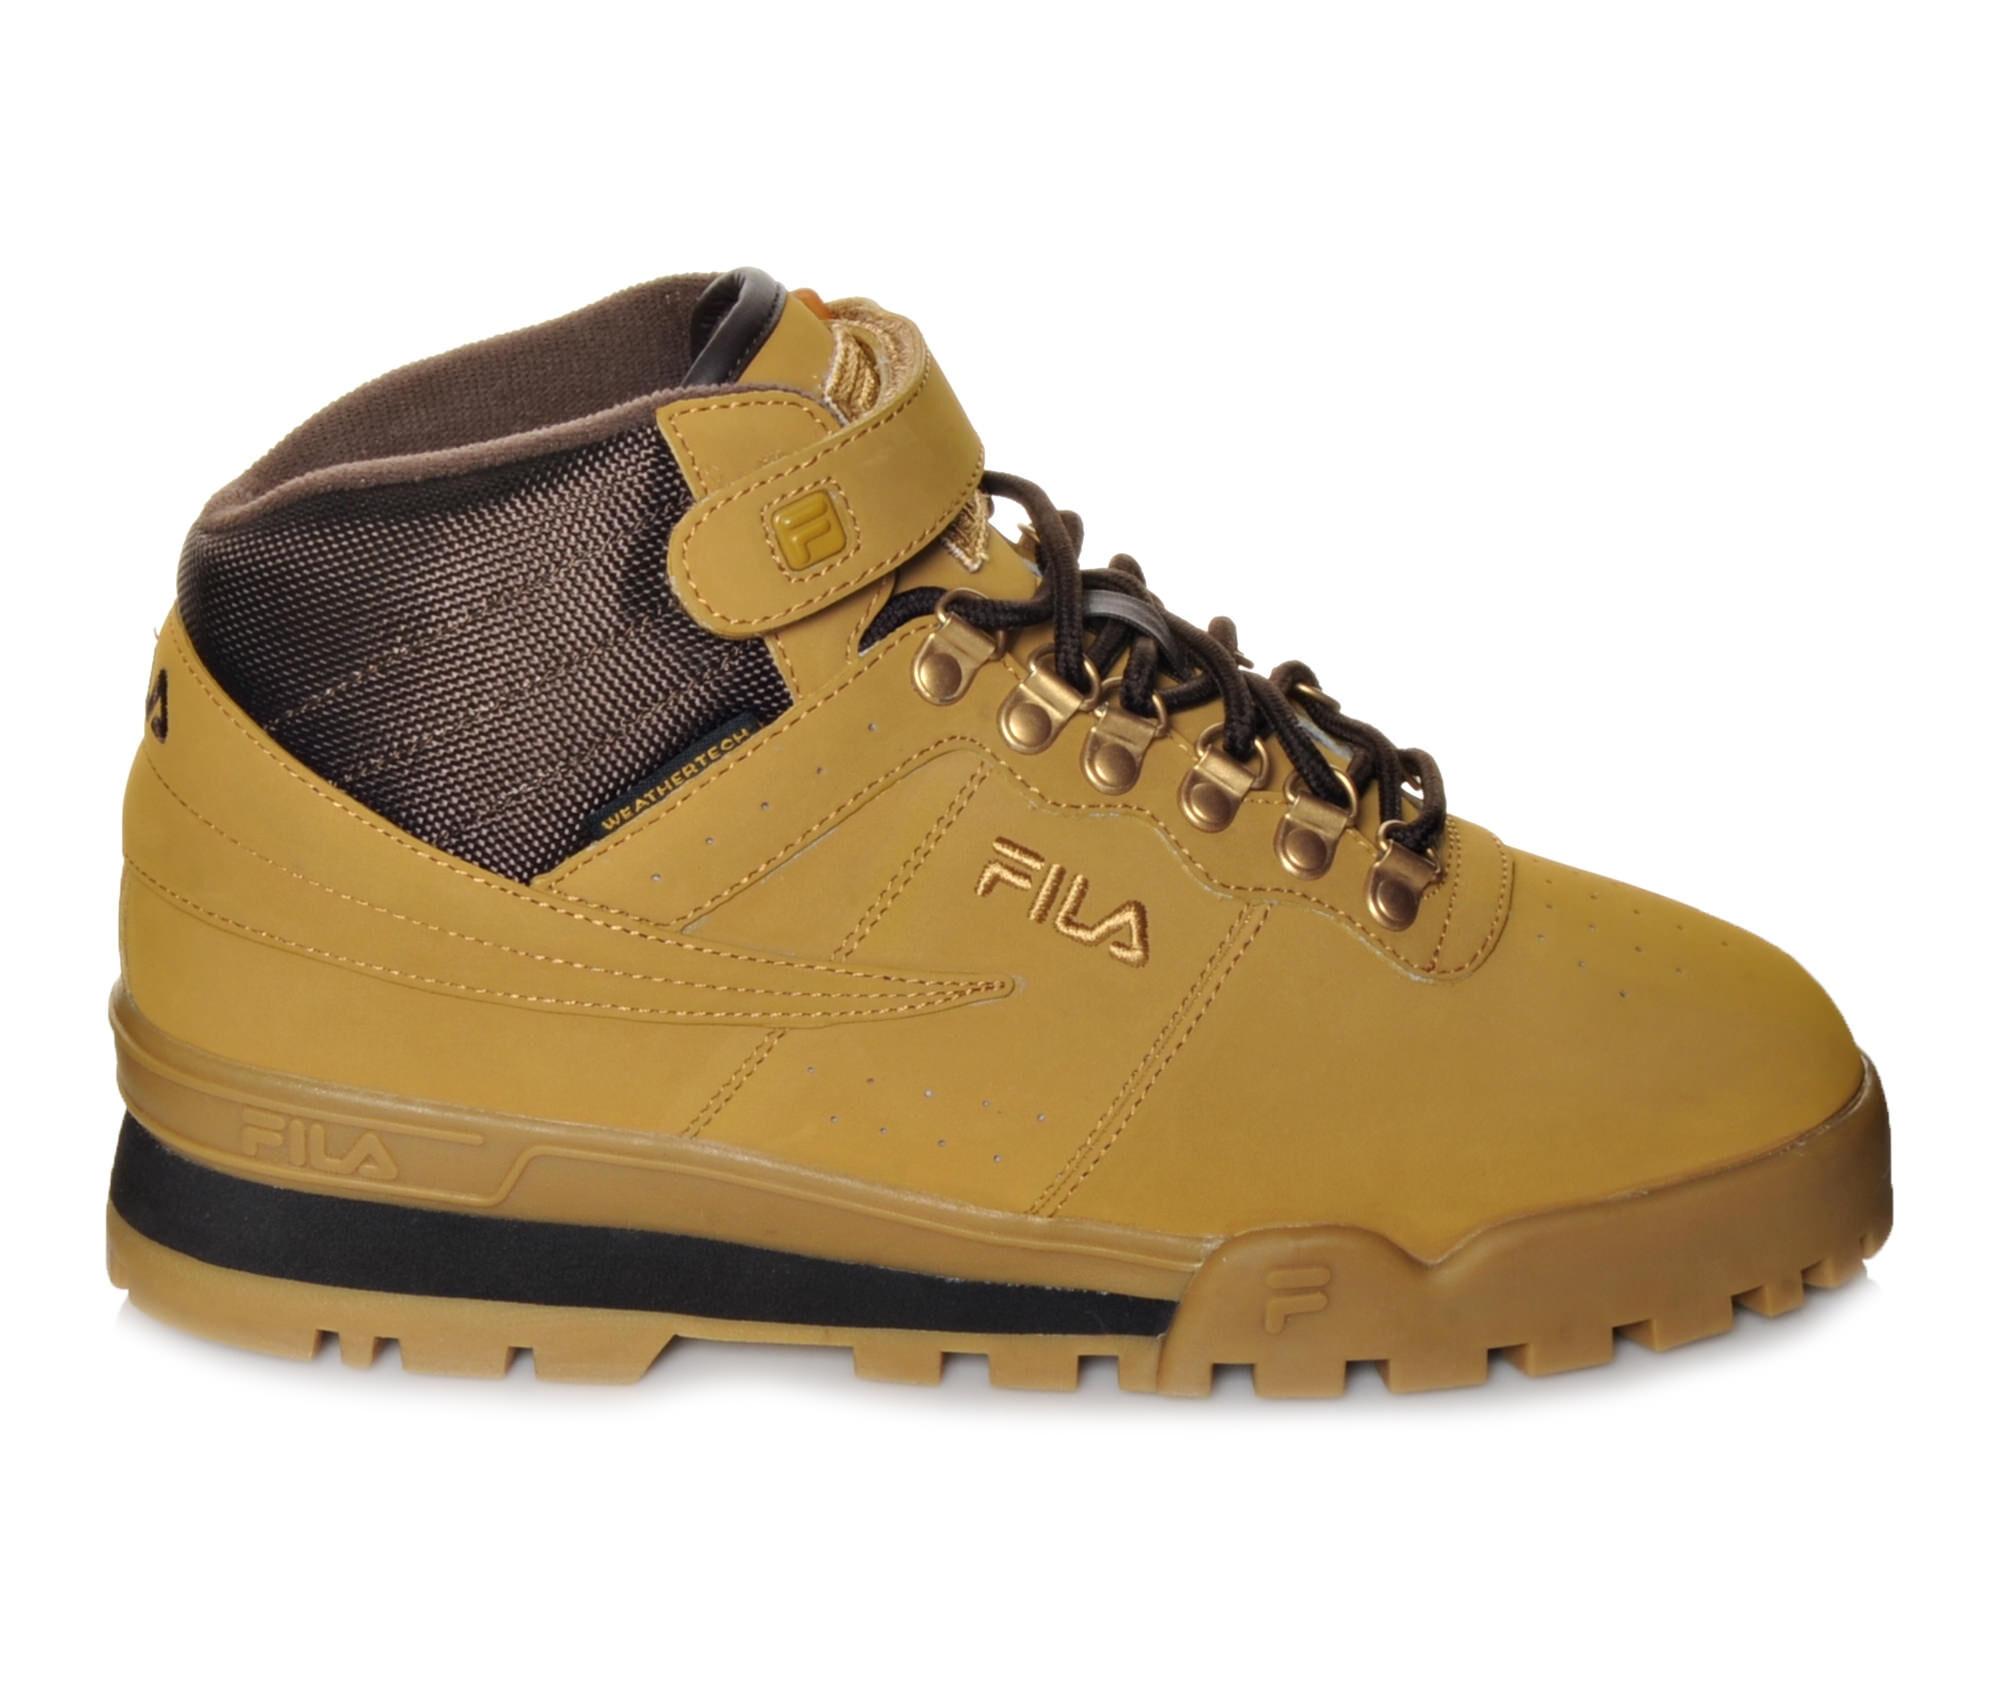 Men's Fila F13 Weathertech Retro Sneakers Wheat